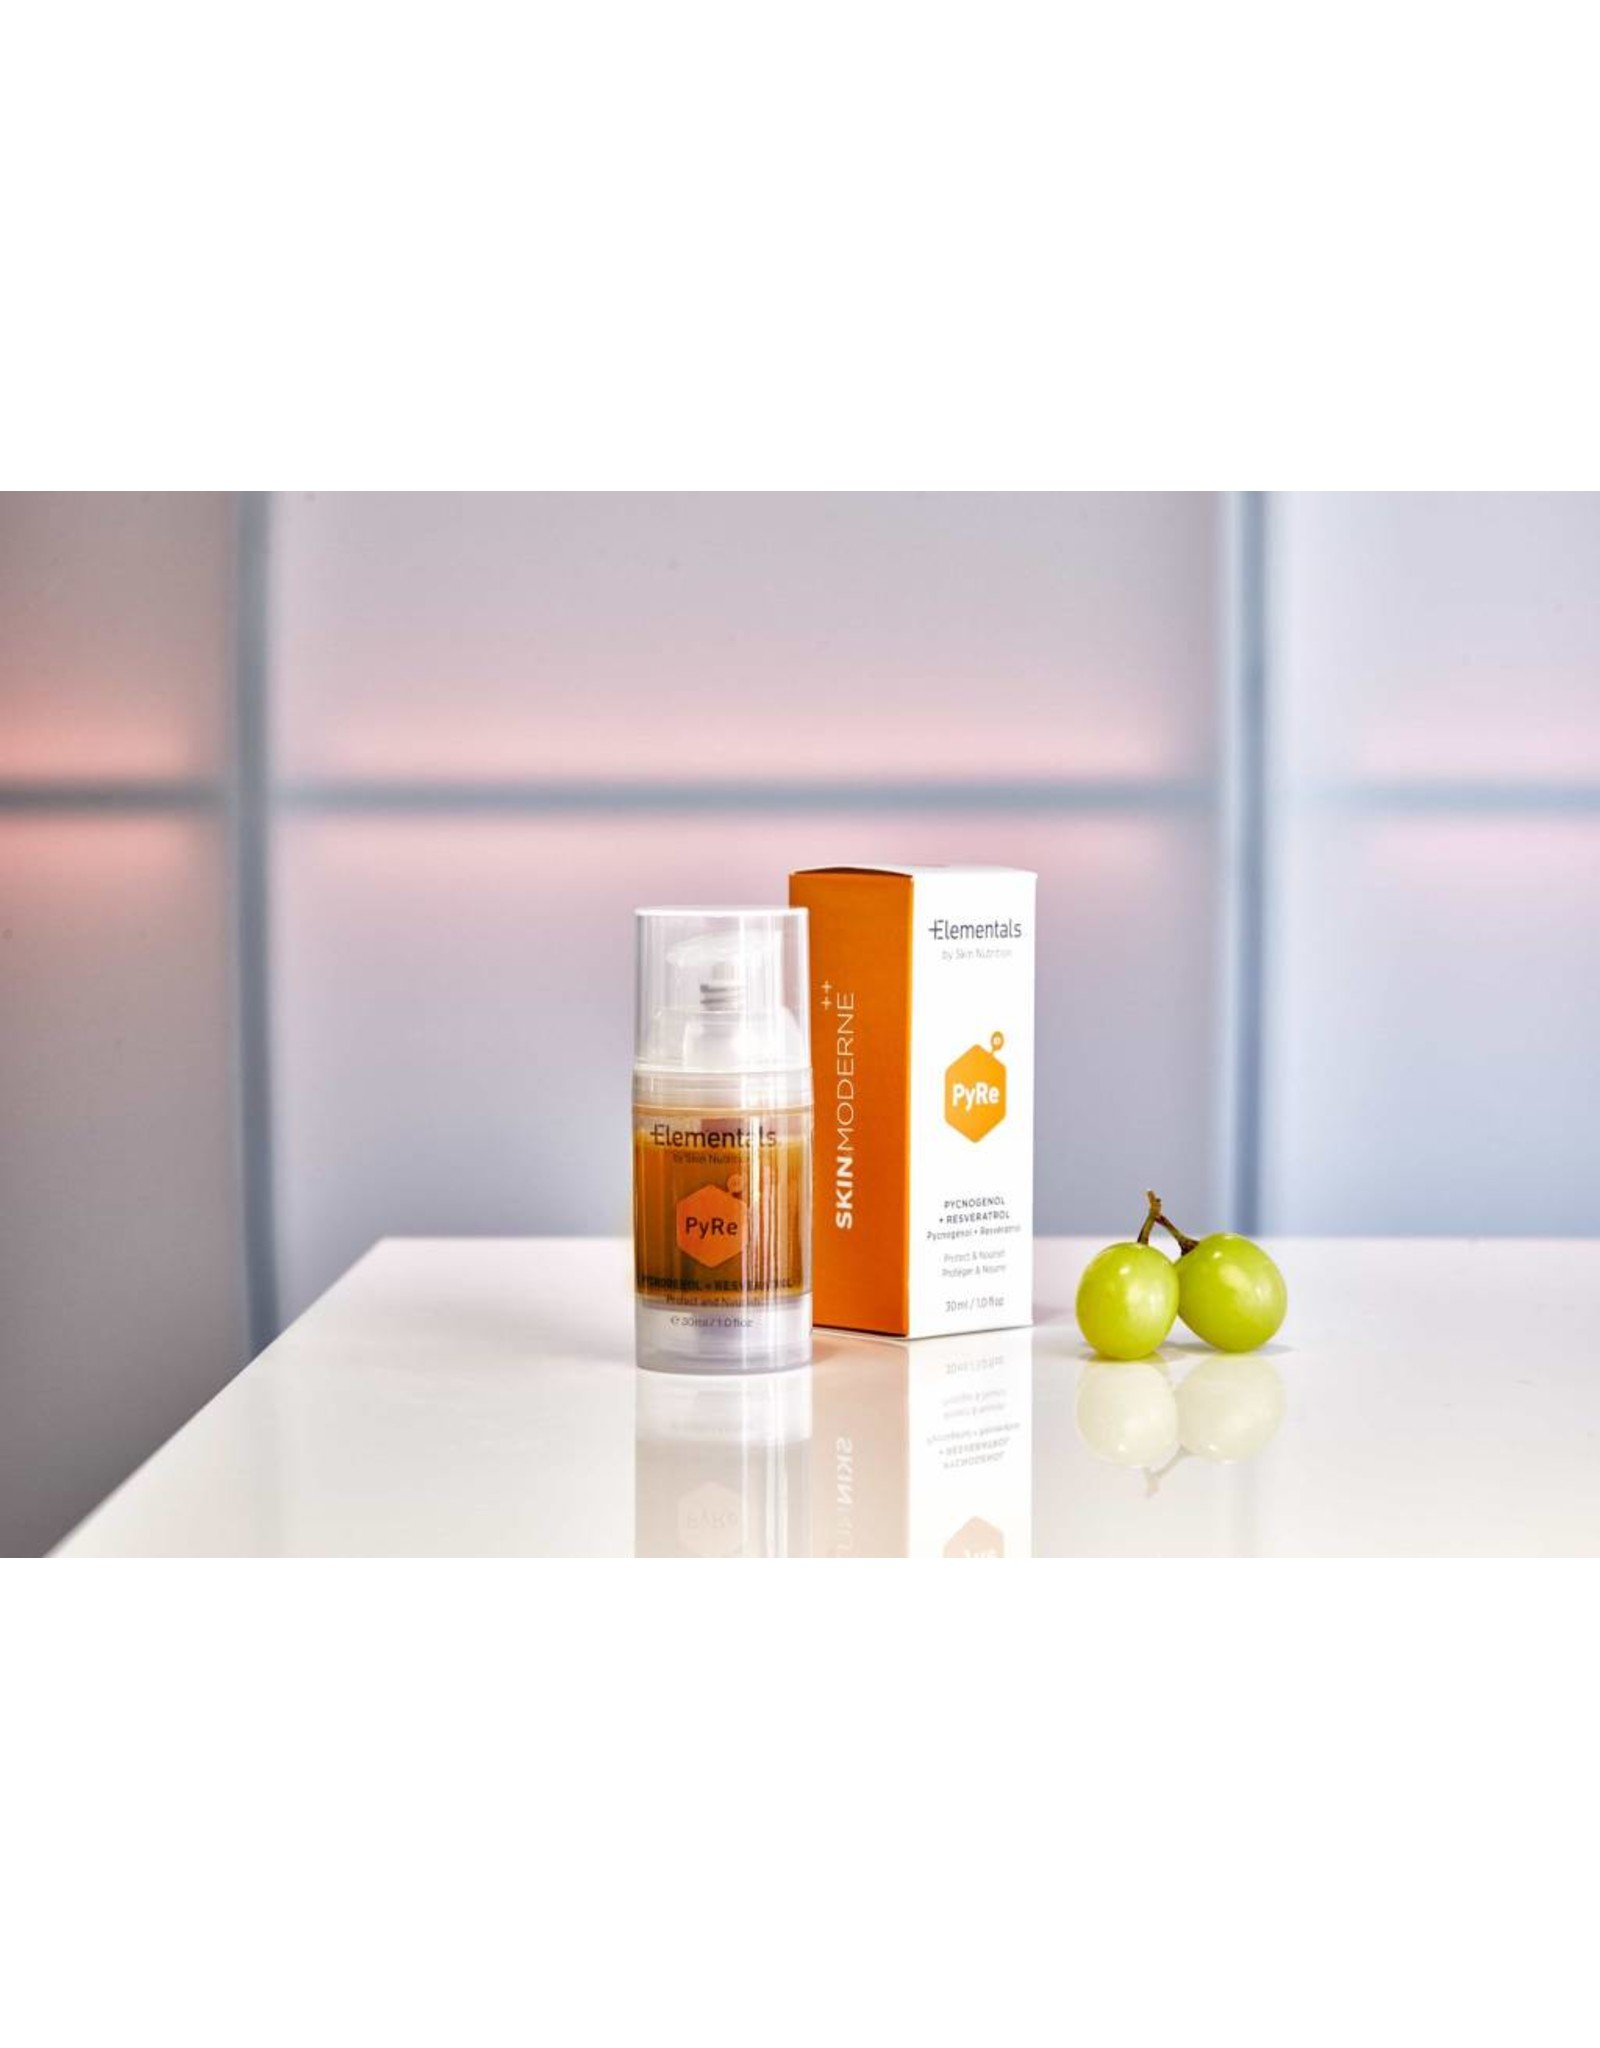 Elementals - by Skin Nutrition Elementals Pycnogenol Resveratrol